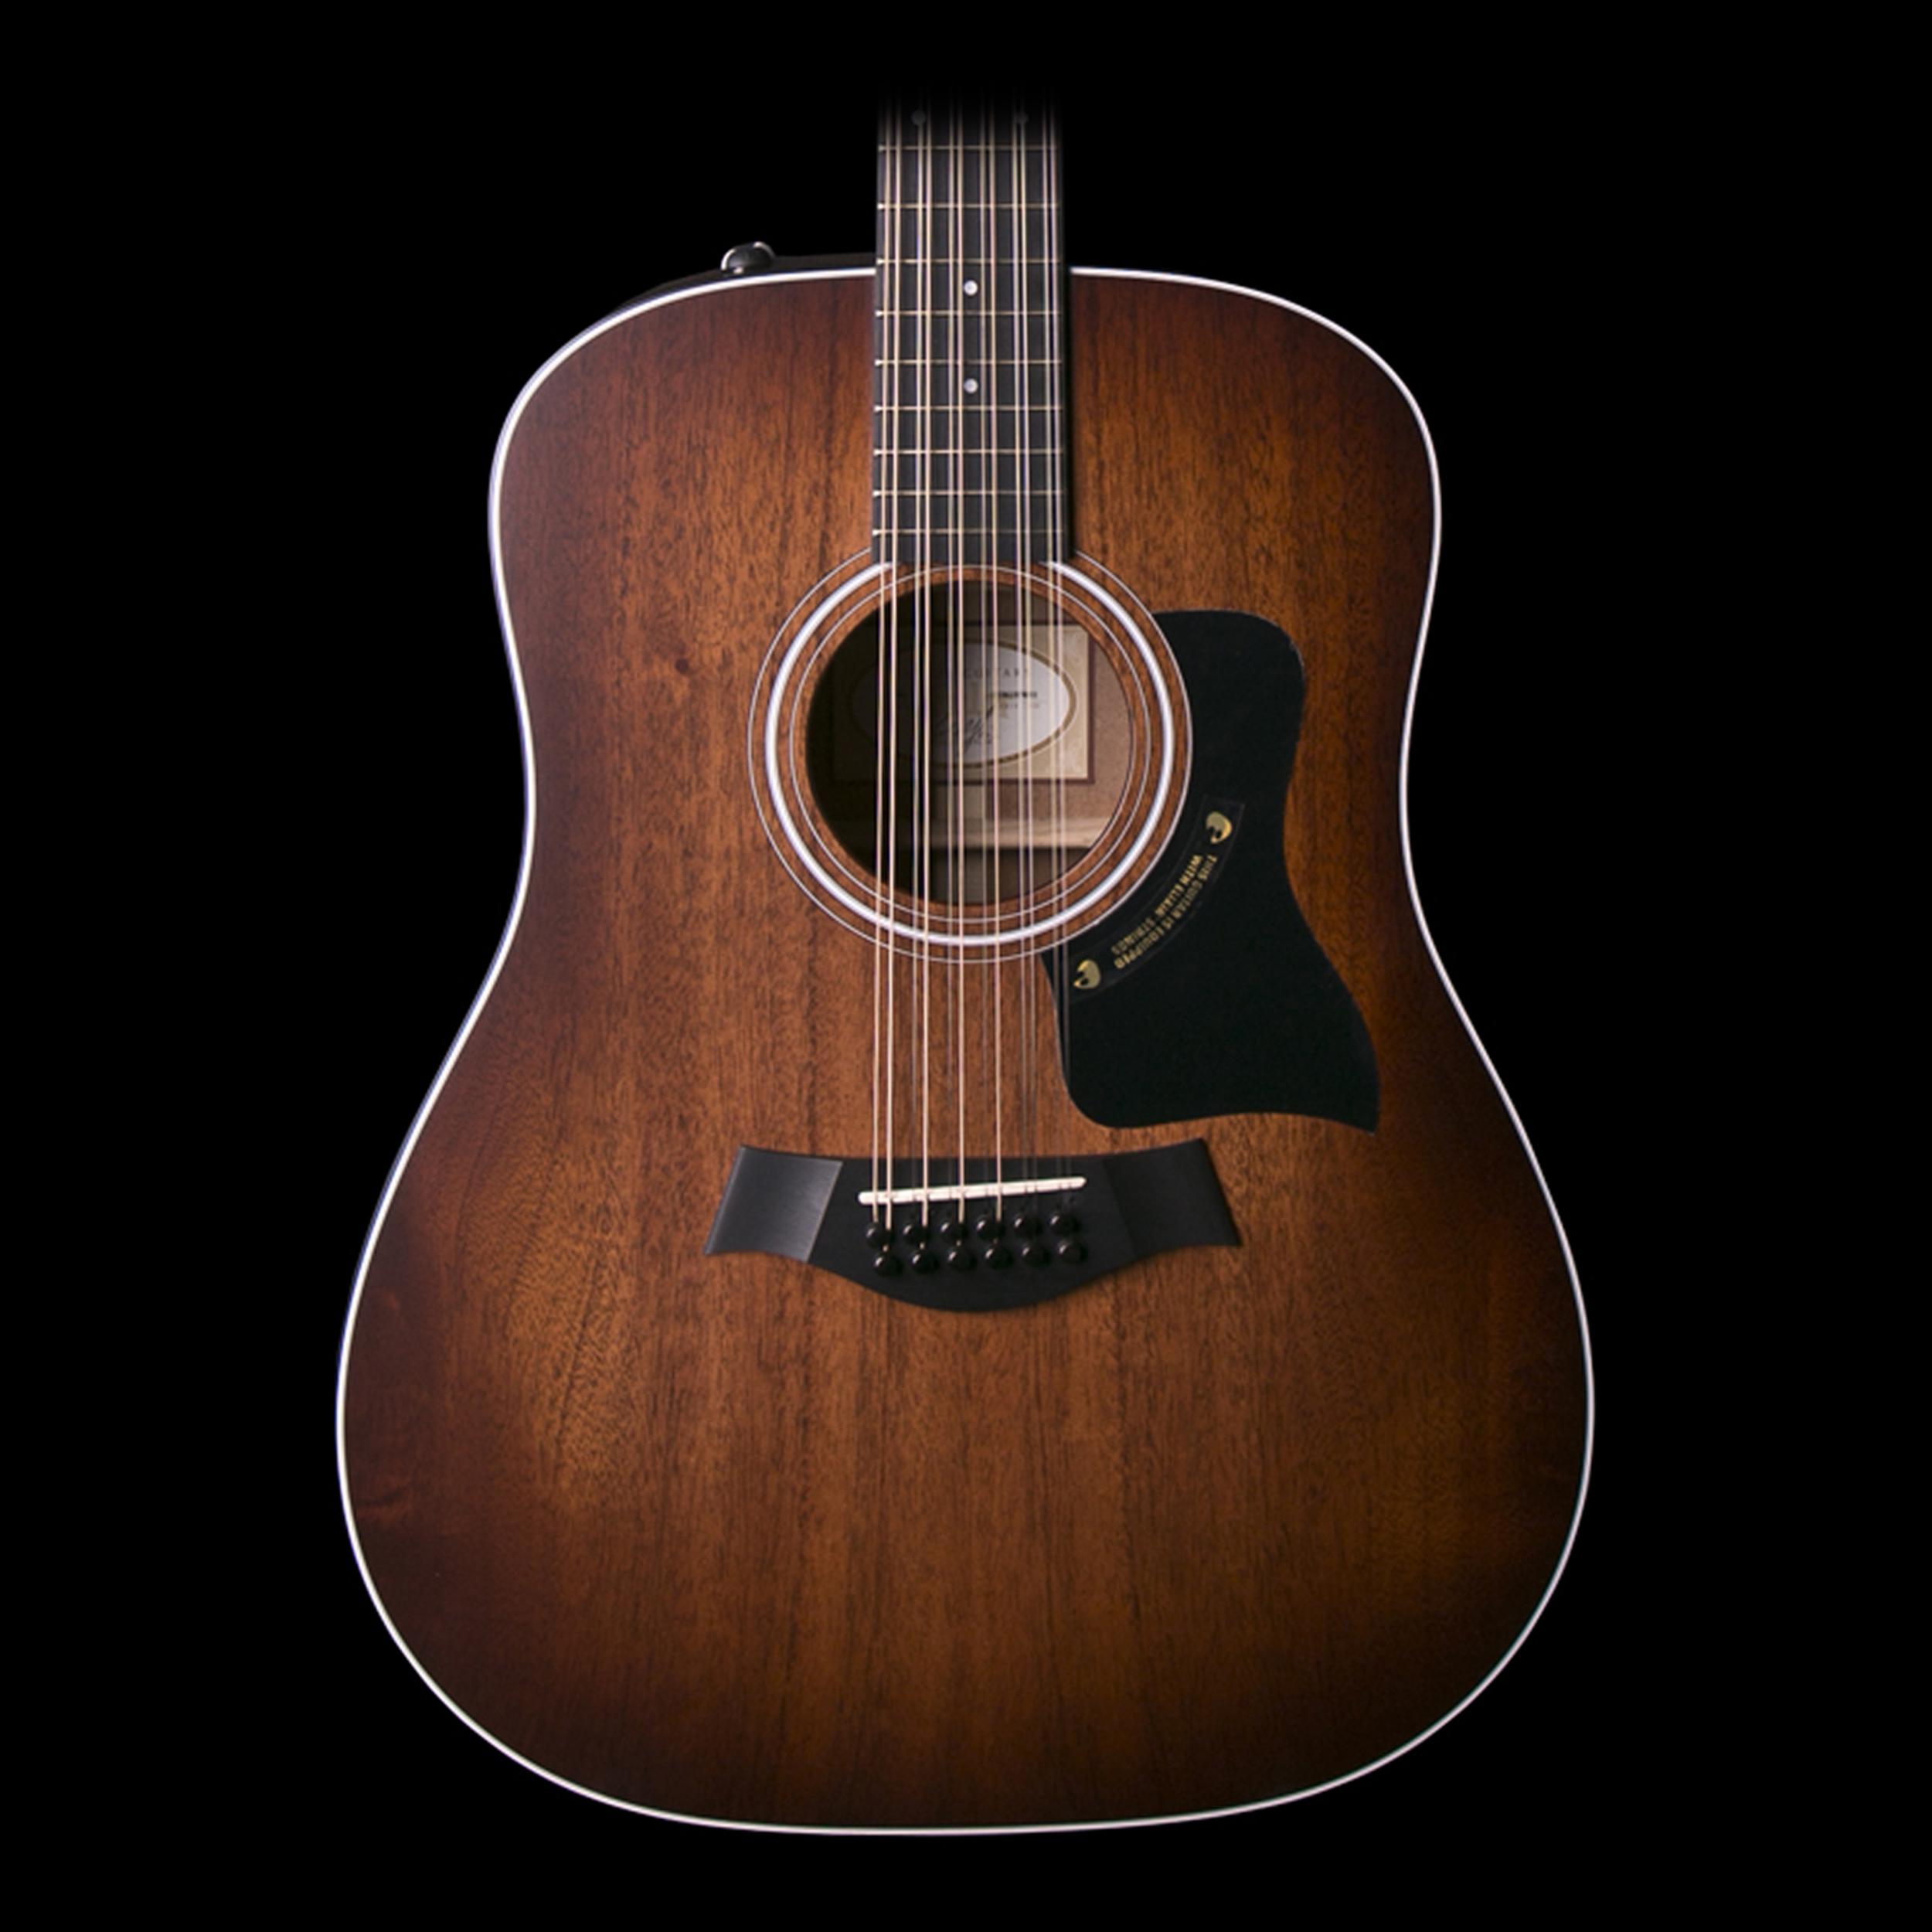 Acoustic Guitar 12 String Tuning : taylor 360e 12 string dreadnought shaded edgeburst acoustic guitar ebay ~ Vivirlamusica.com Haus und Dekorationen